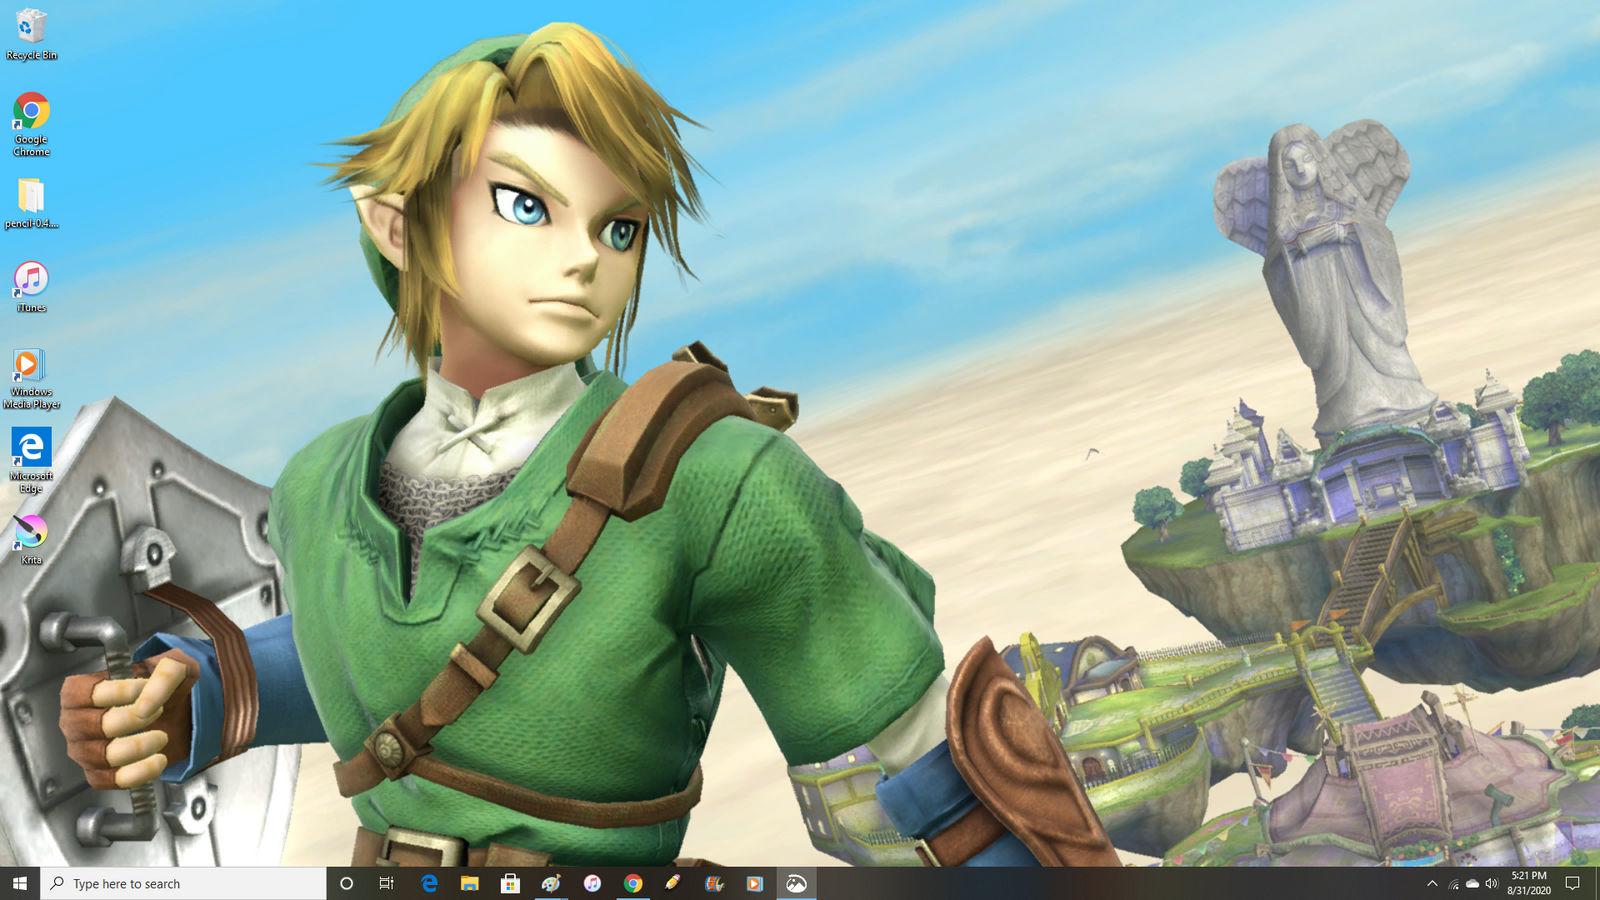 Link In My Desktop Wallpaper By Smashgamer16 On Deviantart